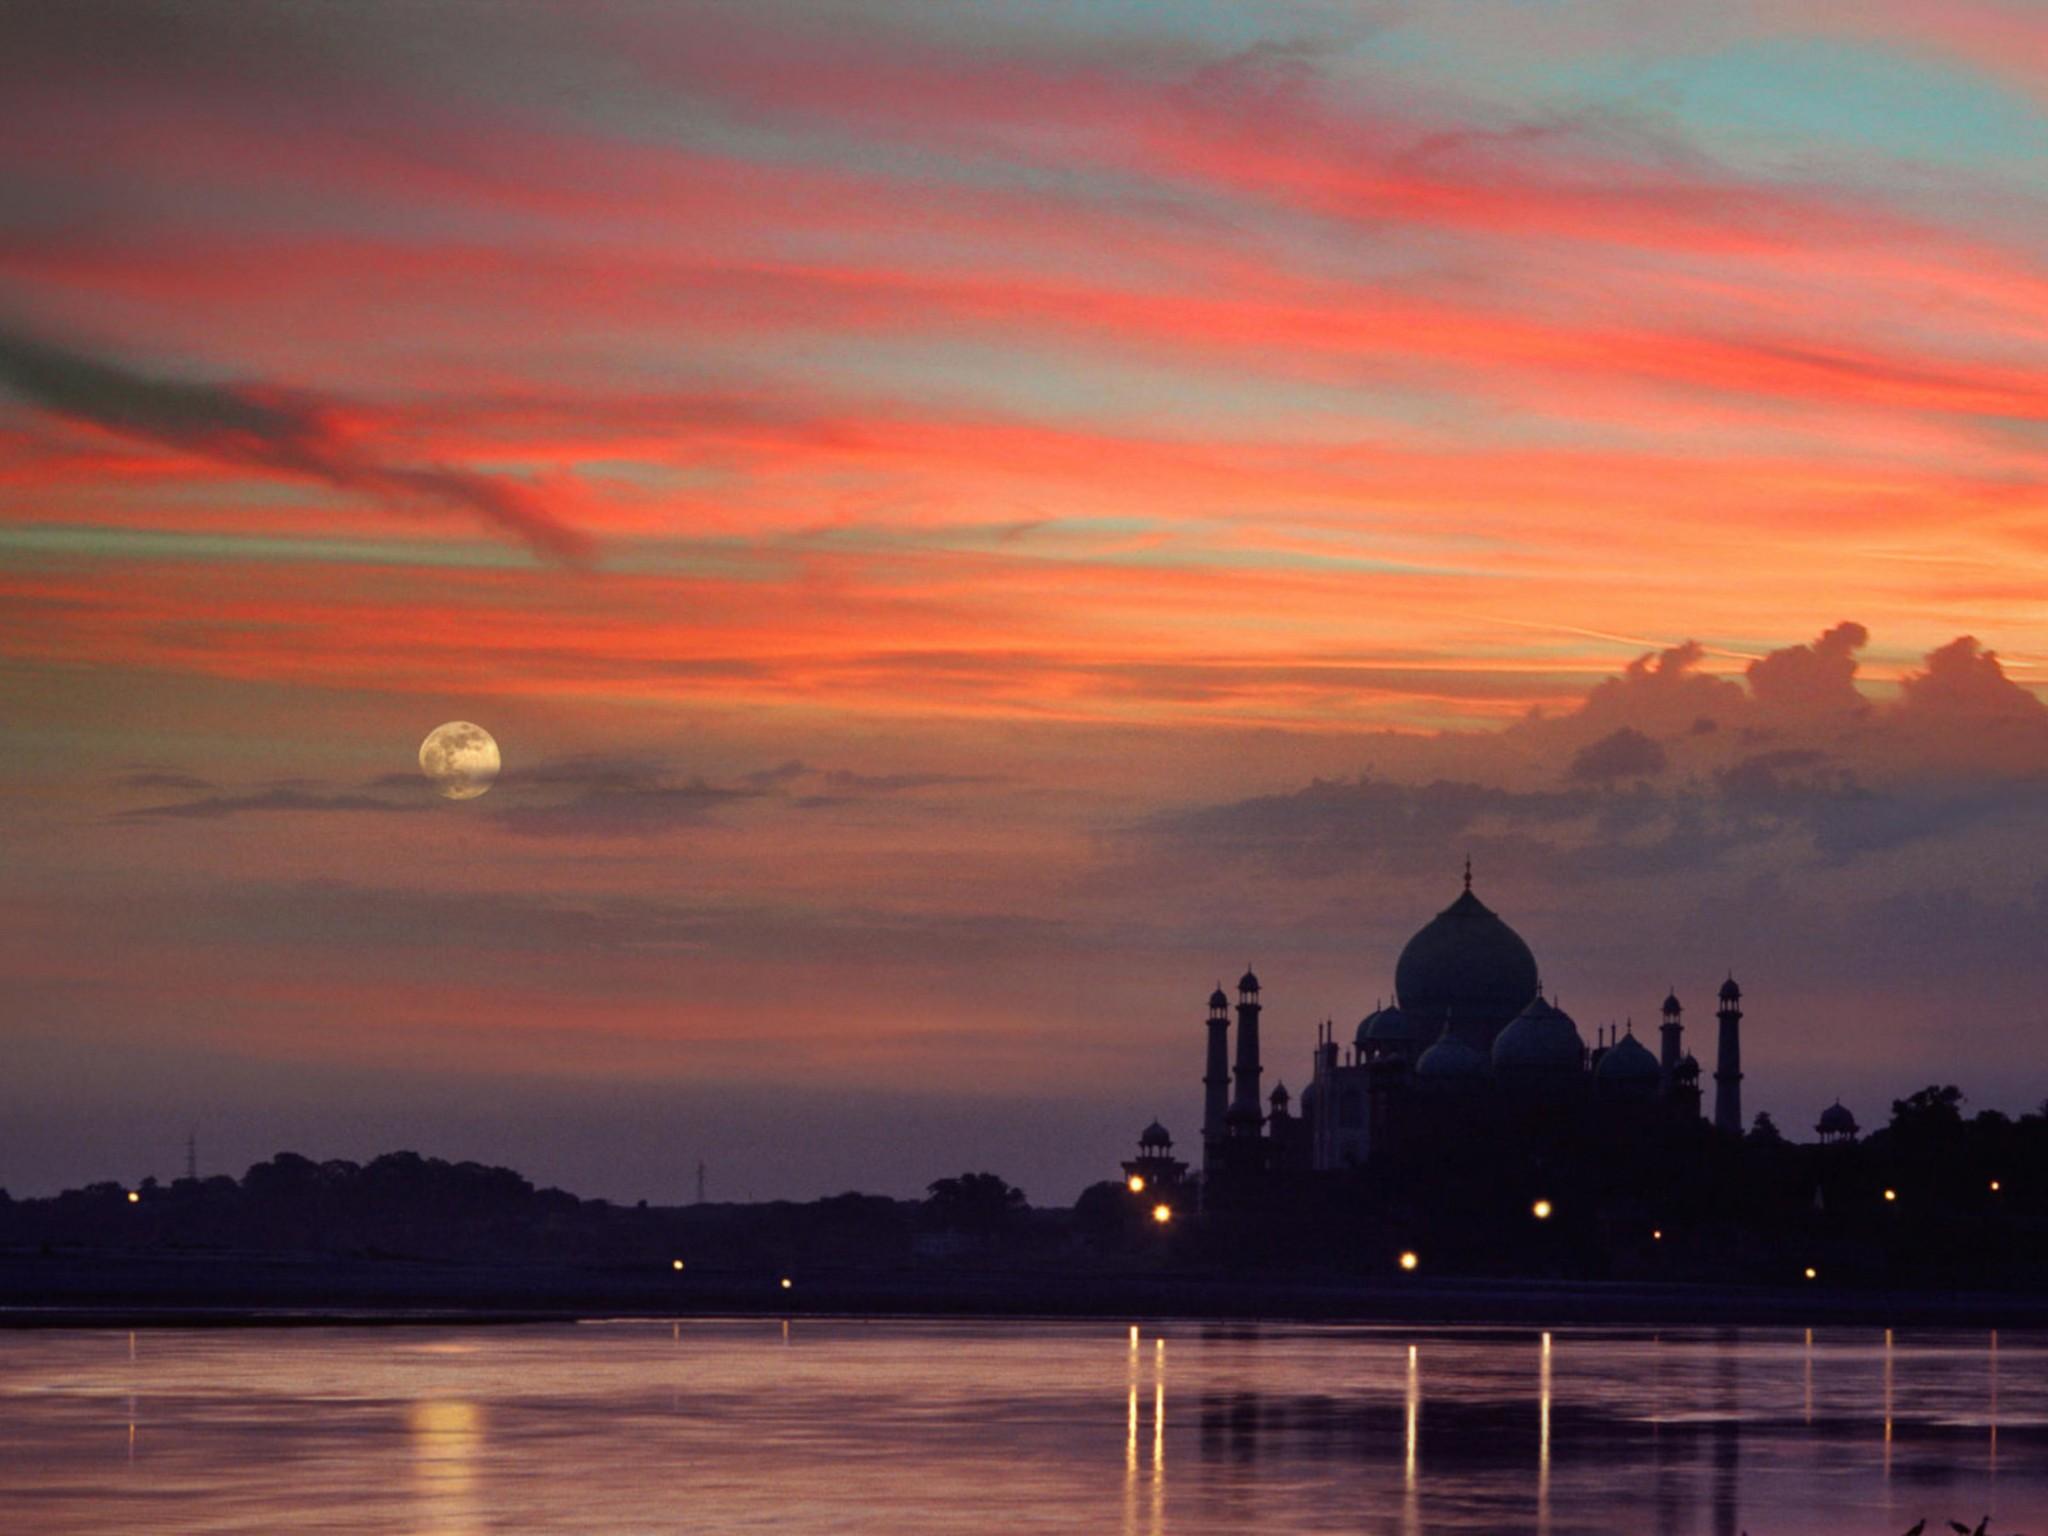 Very Cute Wallpapers For Facebook Taj Mahal Sunset Agra India Wallpaper Free Downloads